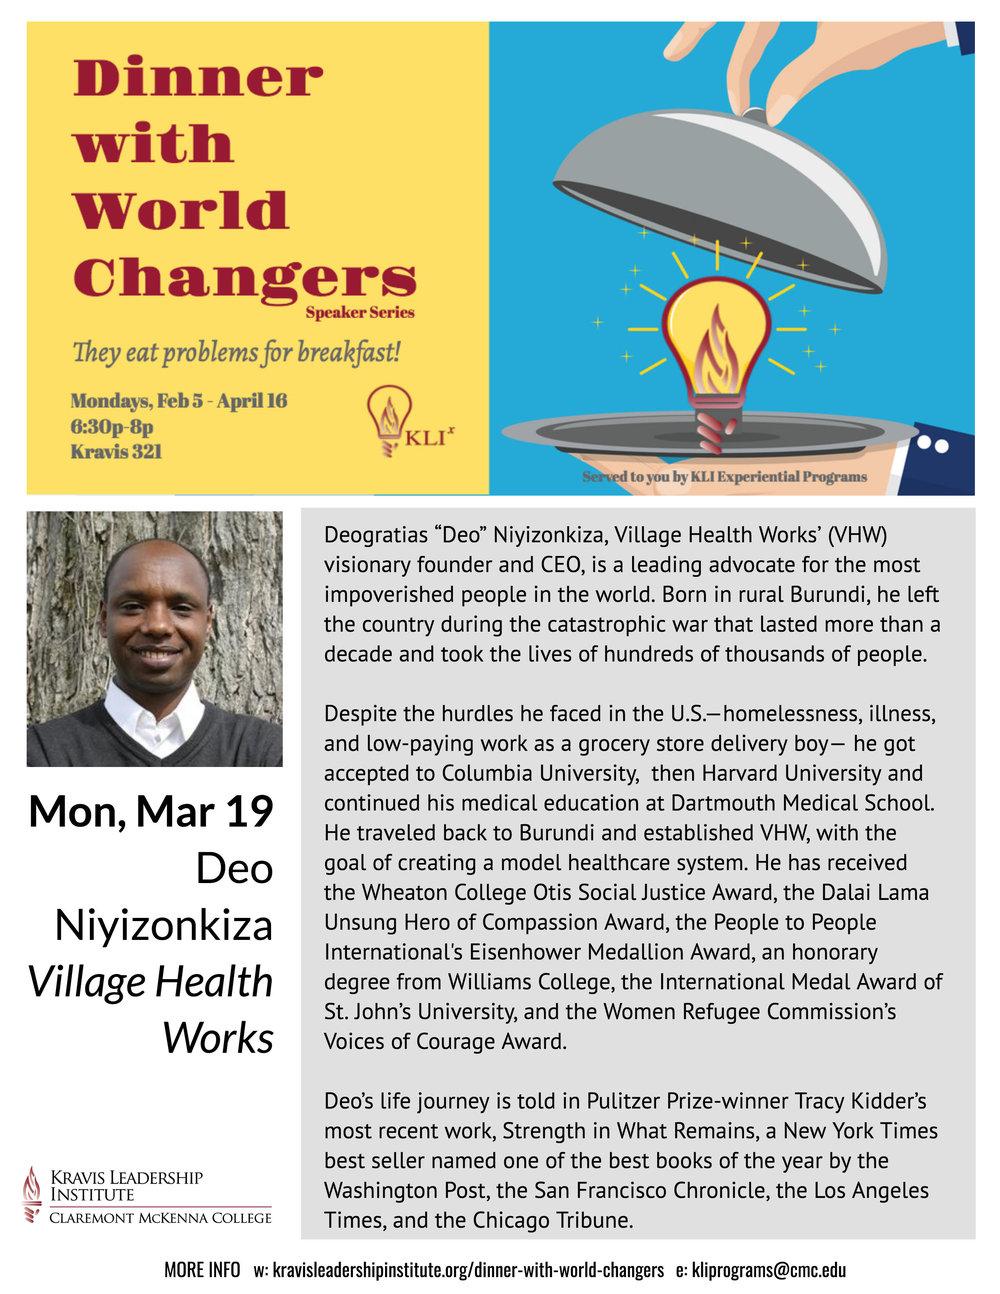 3/19 Dinner With World Changers - Deo Nivizonkiza